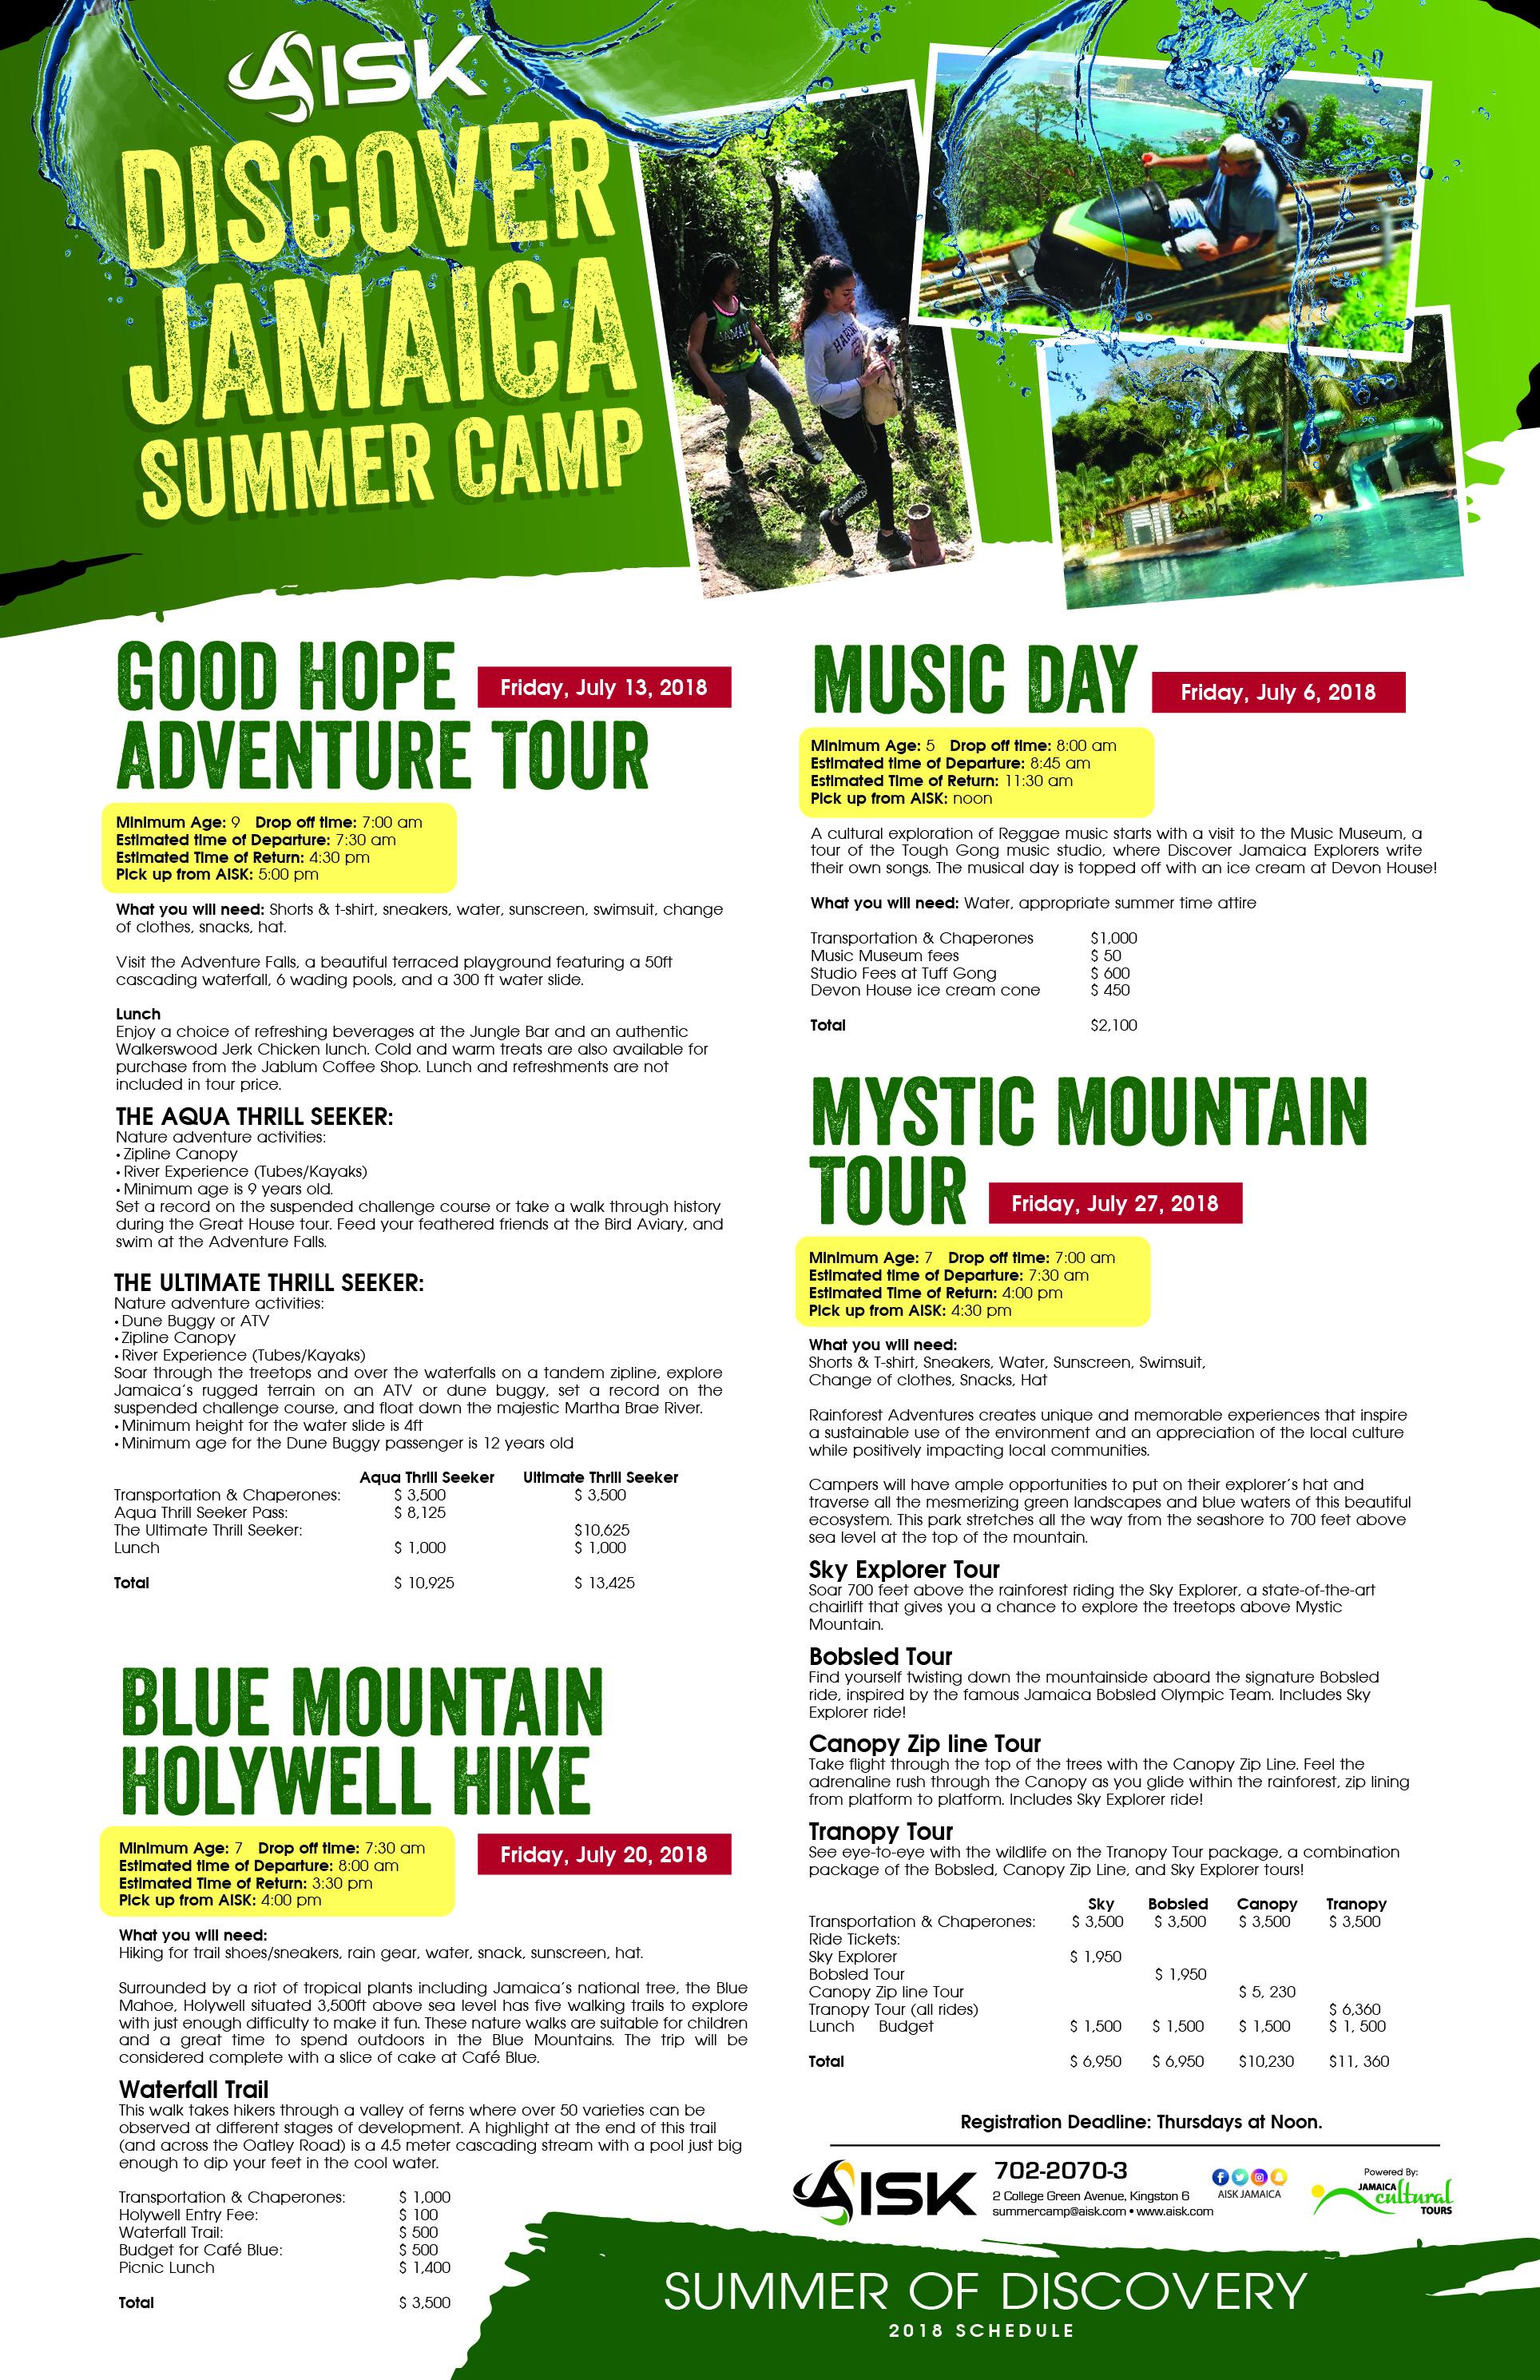 American International School of Kingston: Summer Camps 2018